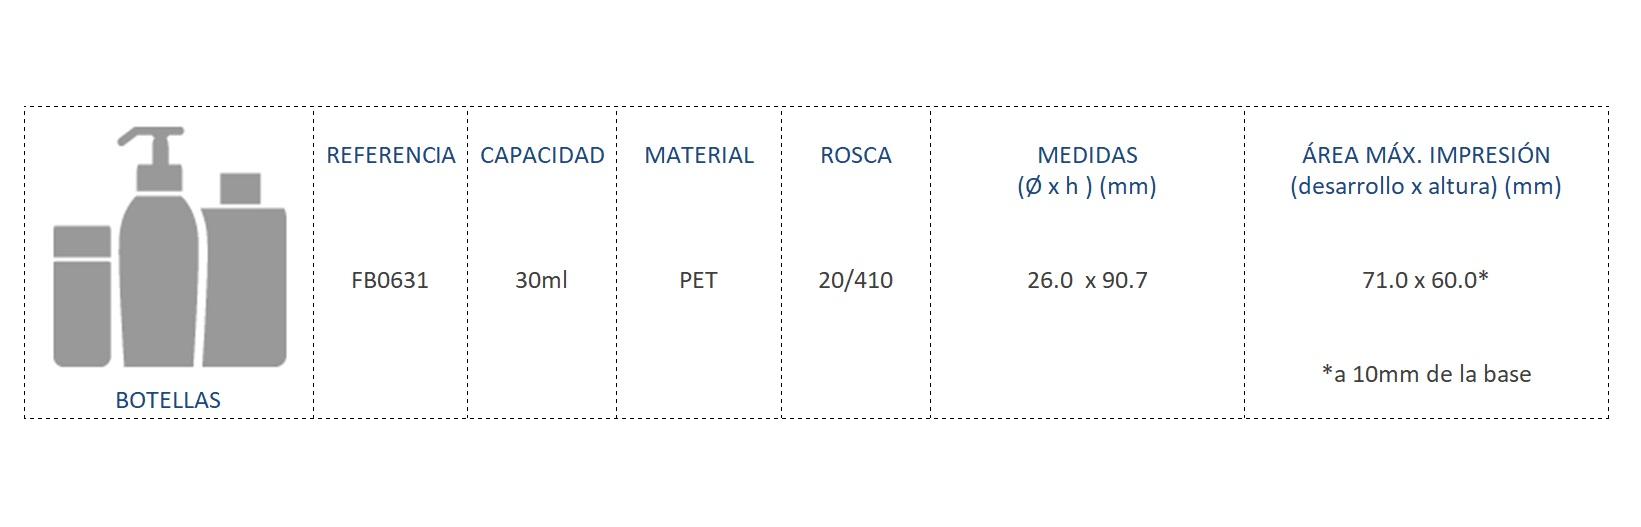 Cuadro de materiales FB0631